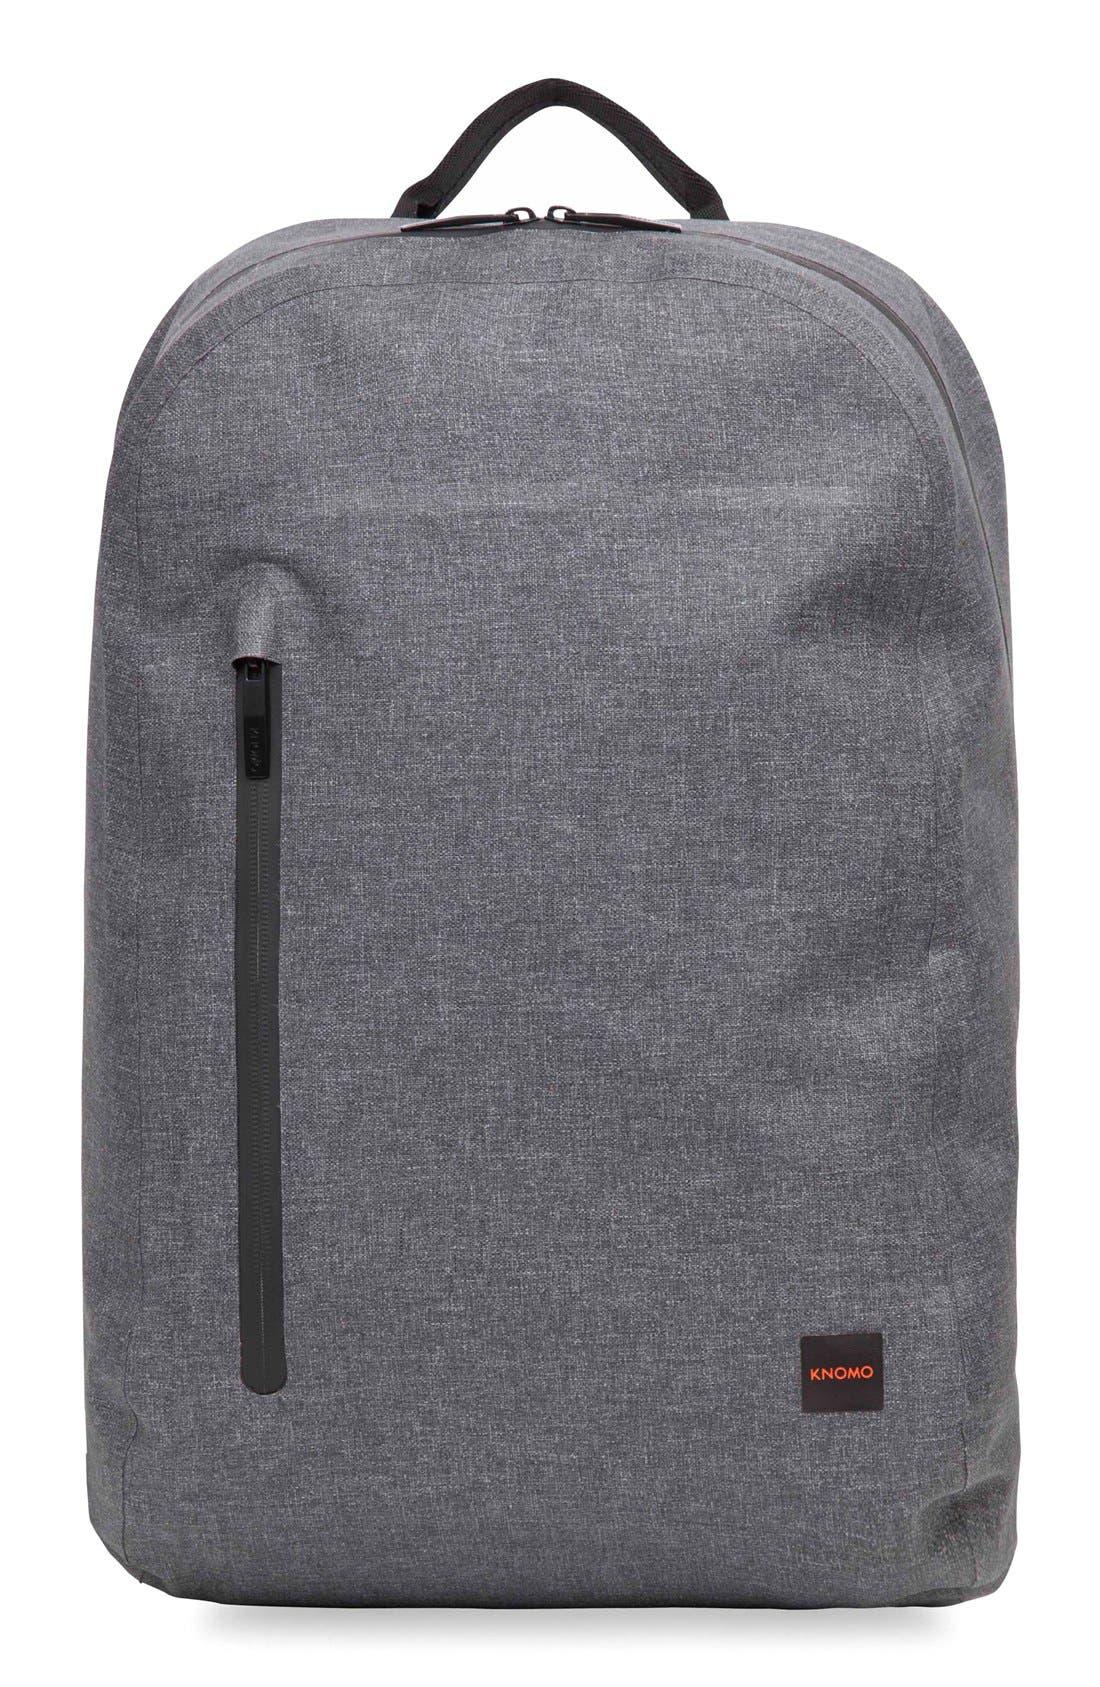 Thames Harpsden Backpack,                             Main thumbnail 1, color,                             Grey